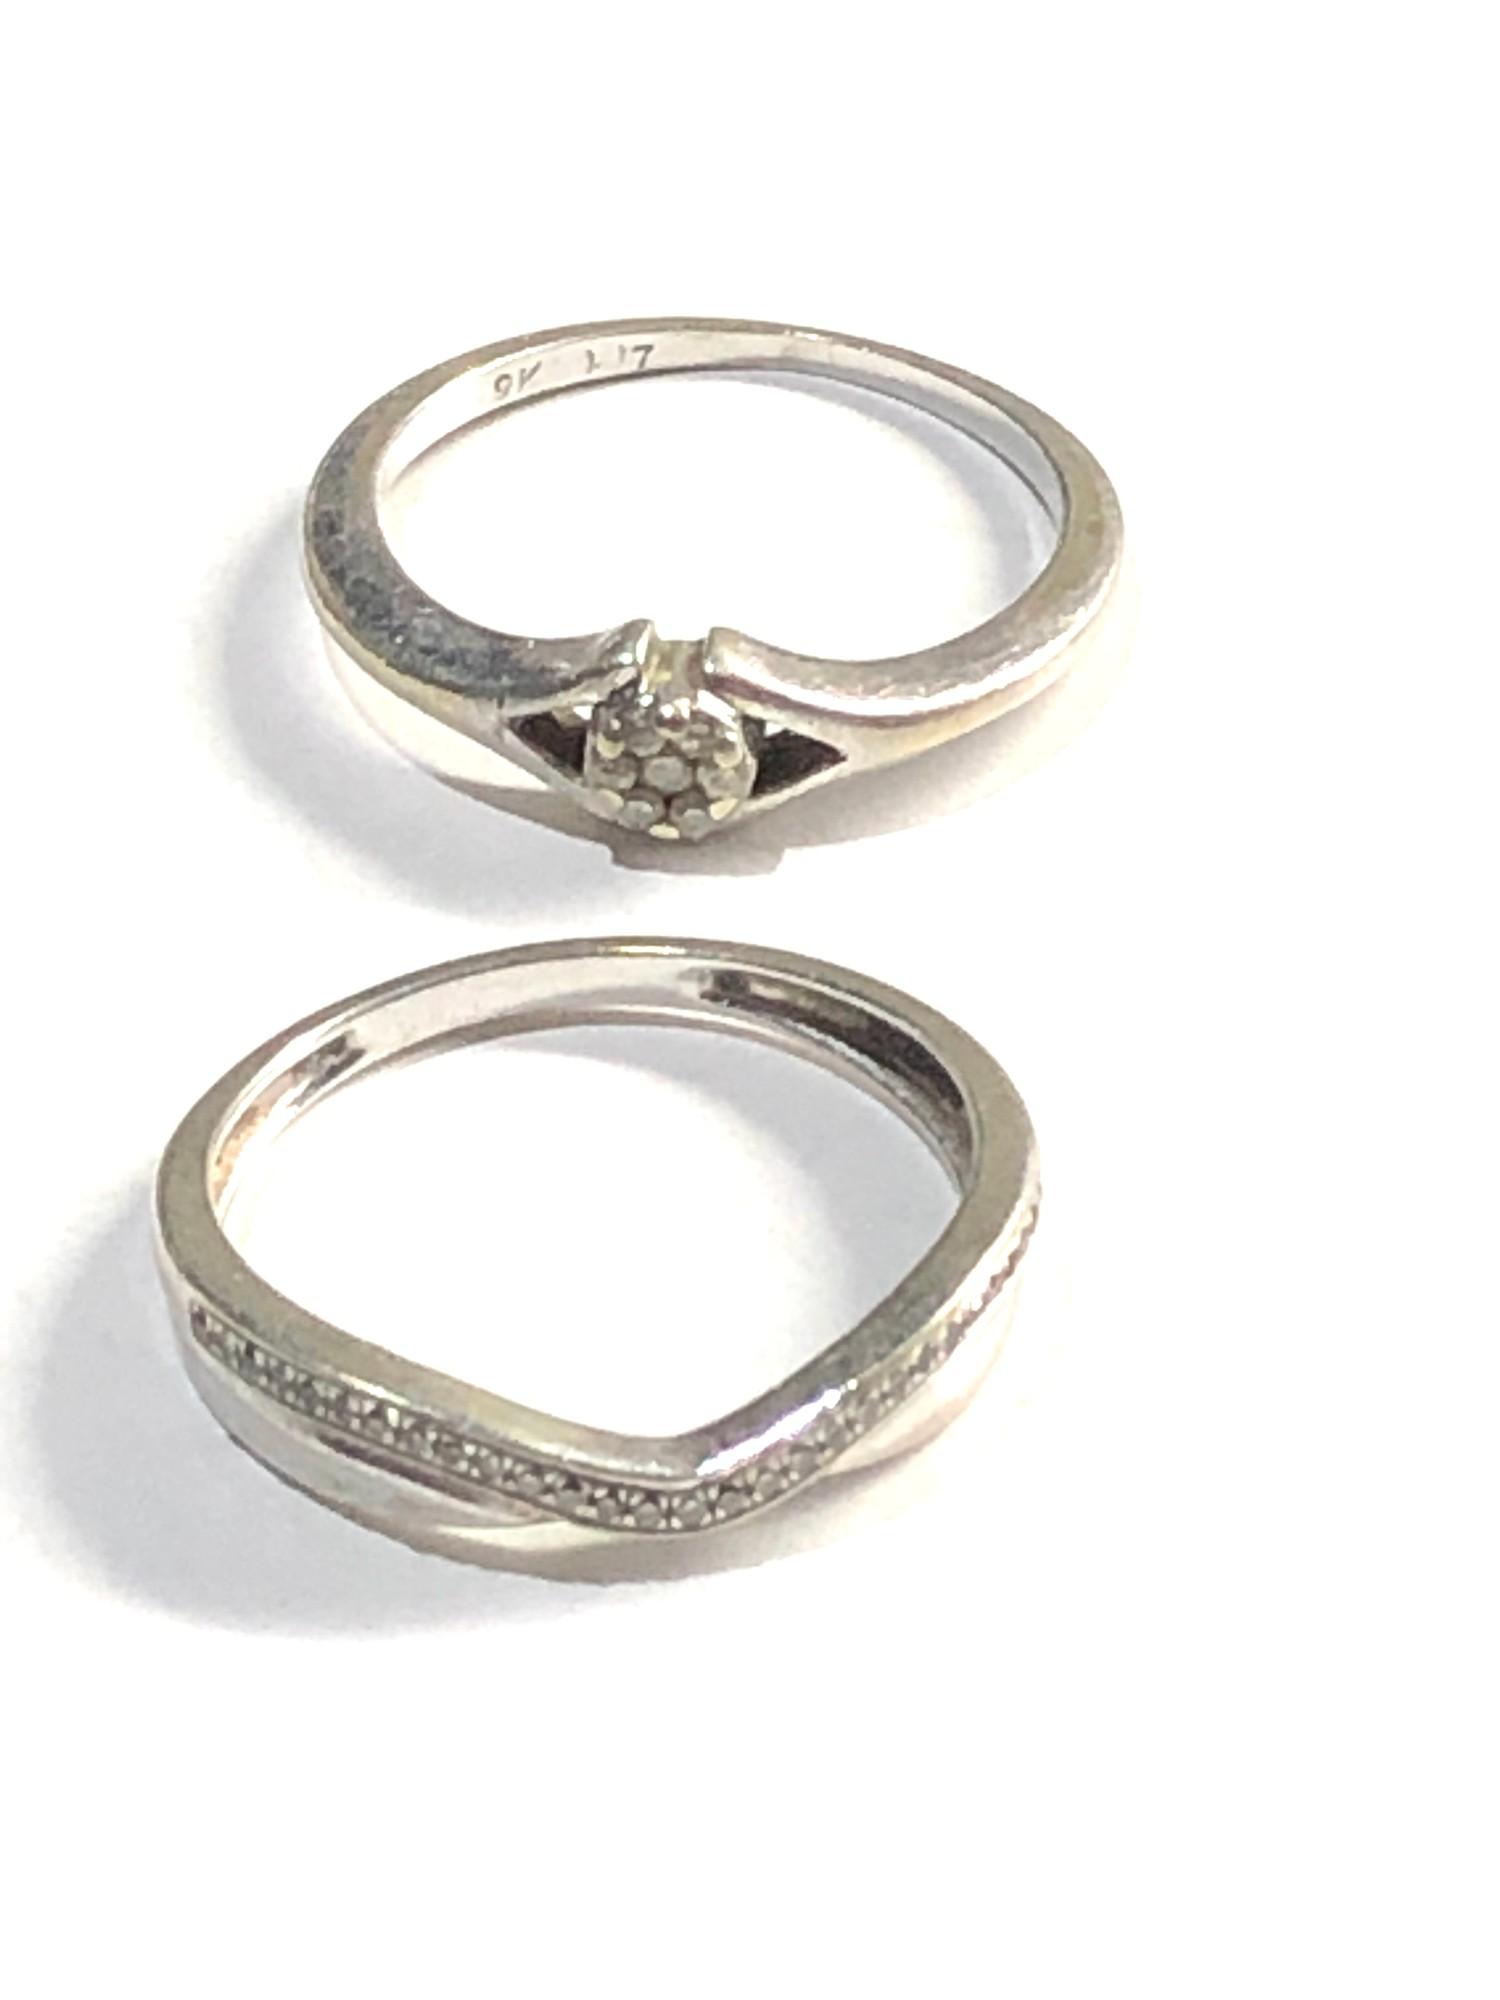 2 x 9ct white gold diamond set rings 3.1g